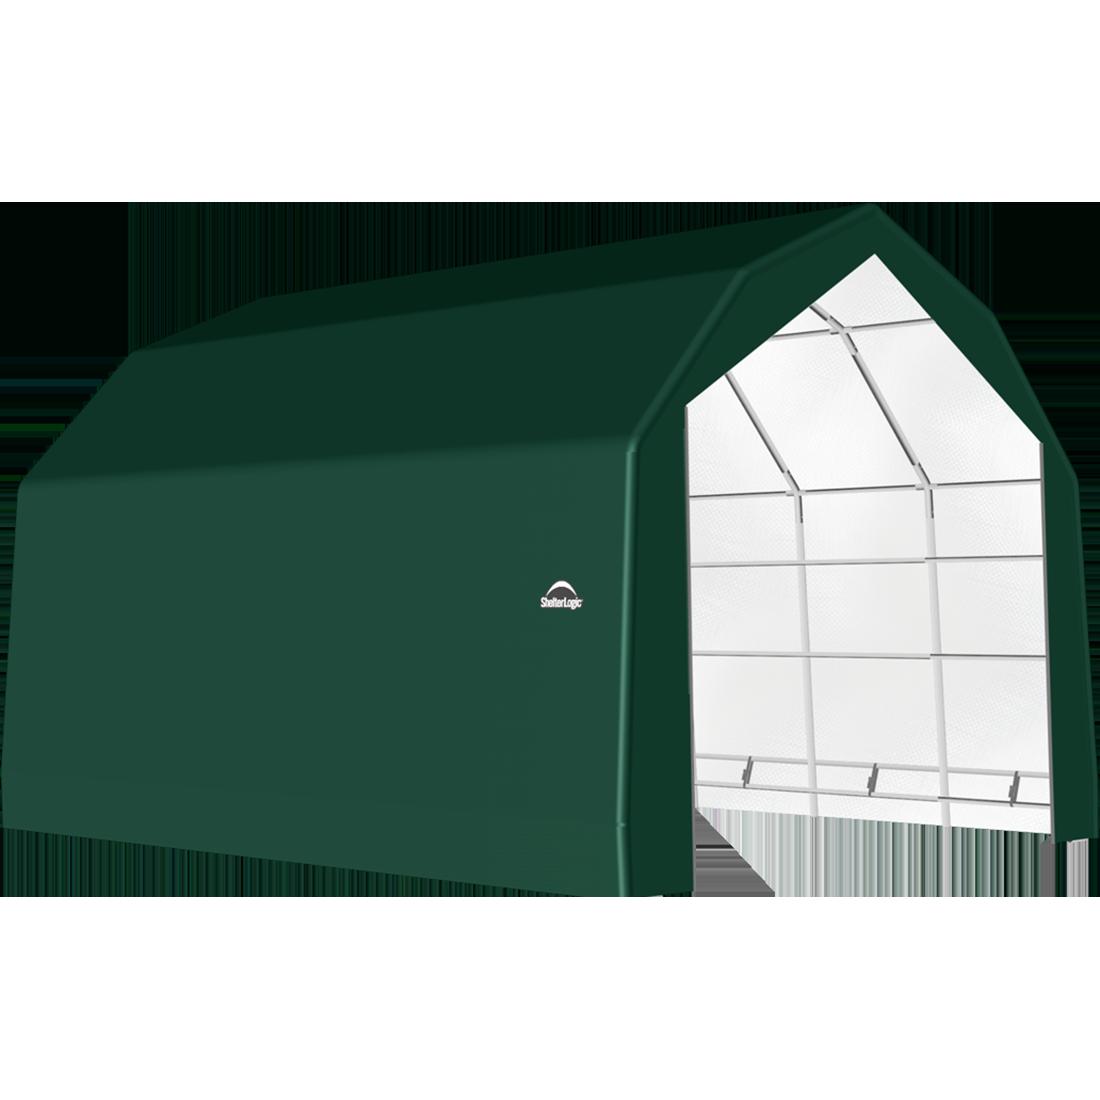 SP Barn 20X20X15 Green 14 oz PE Shelter